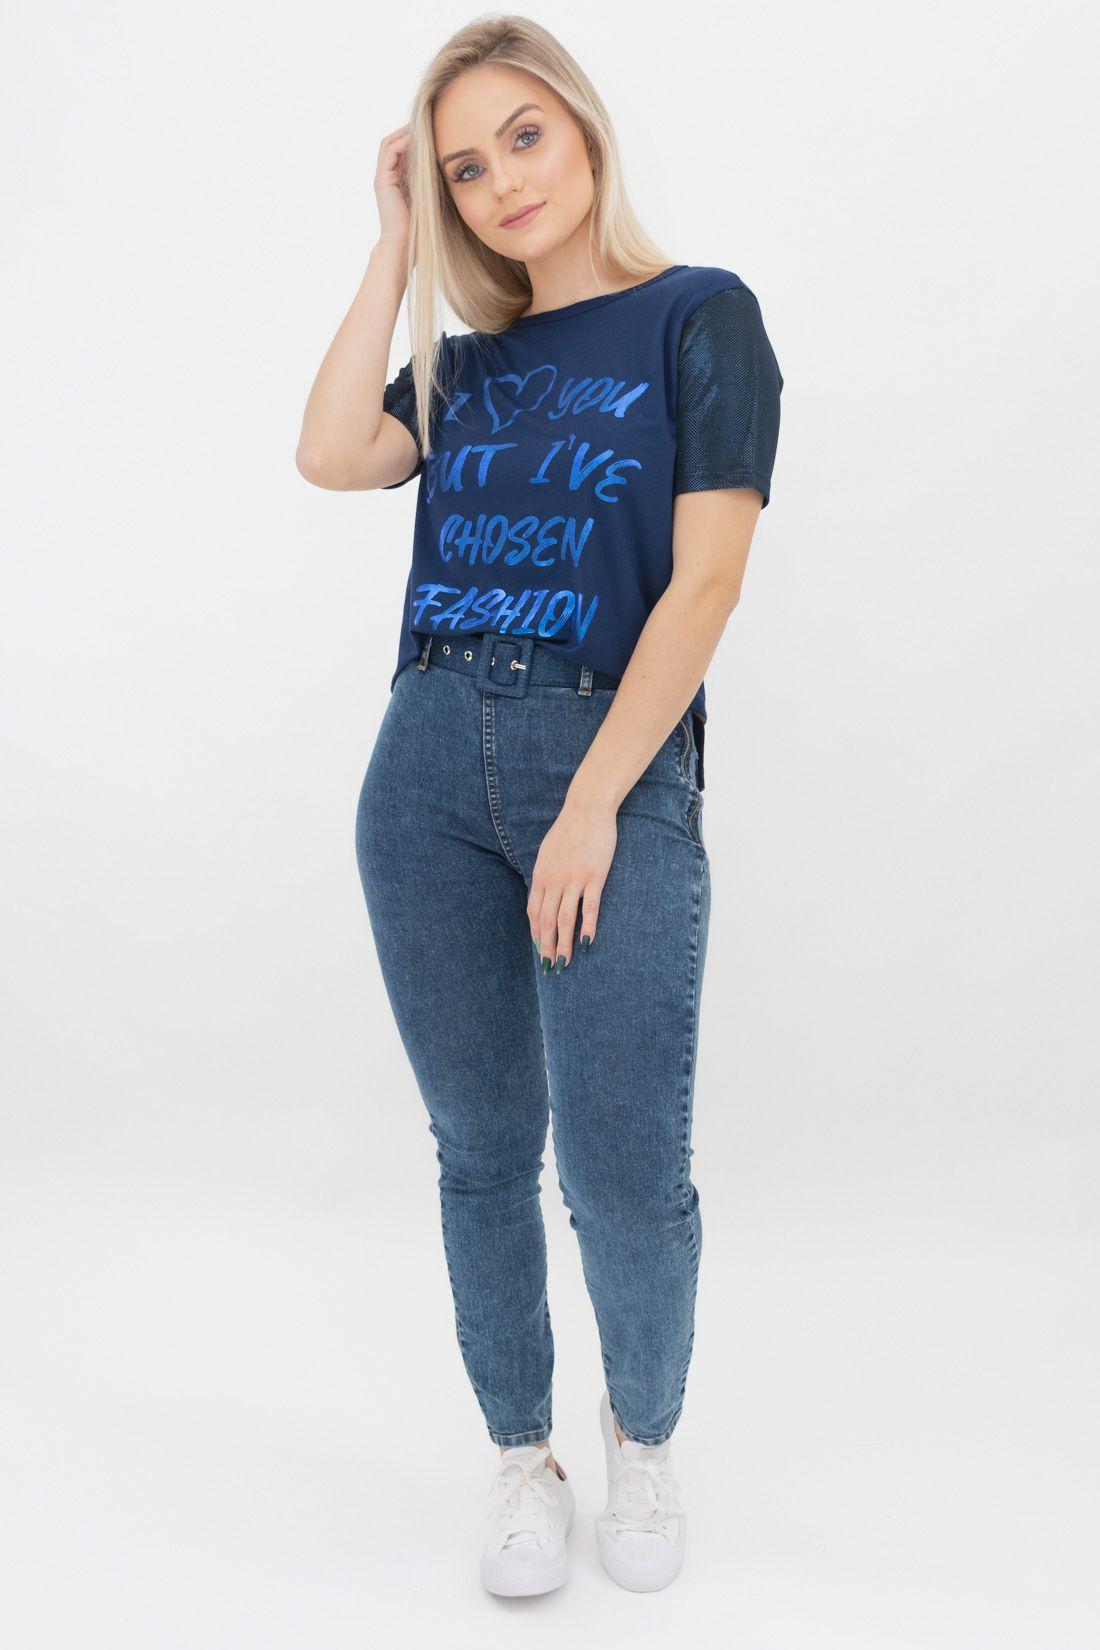 T Shirt Slywear I You But I Ve